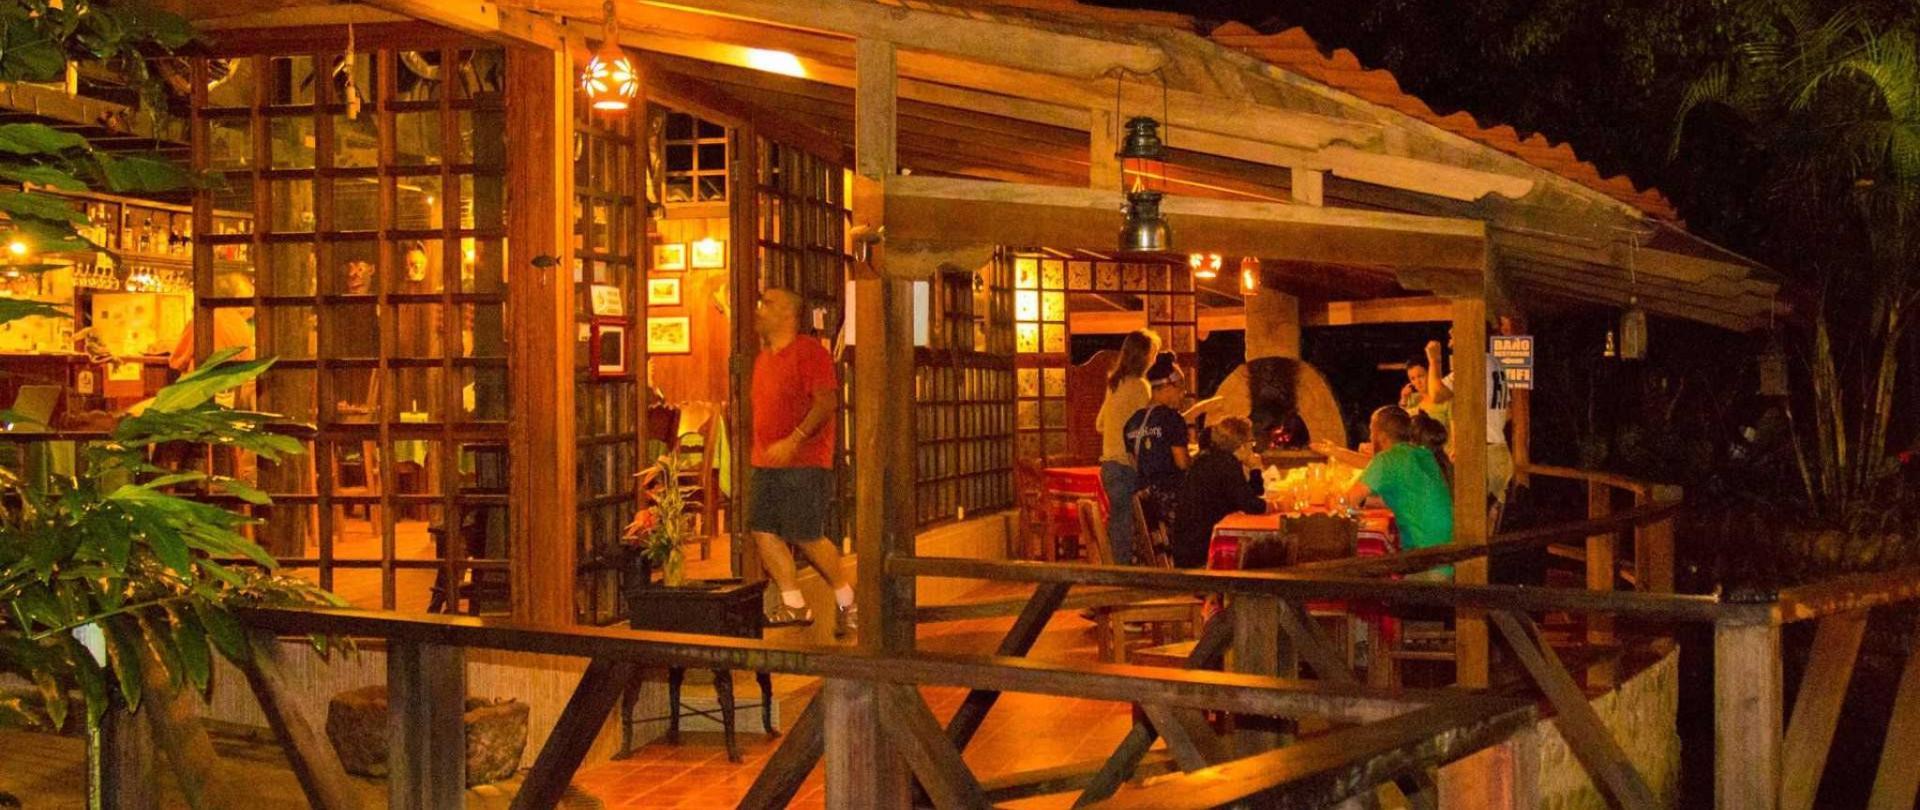 restaurante-con-chimenea-1.jpg